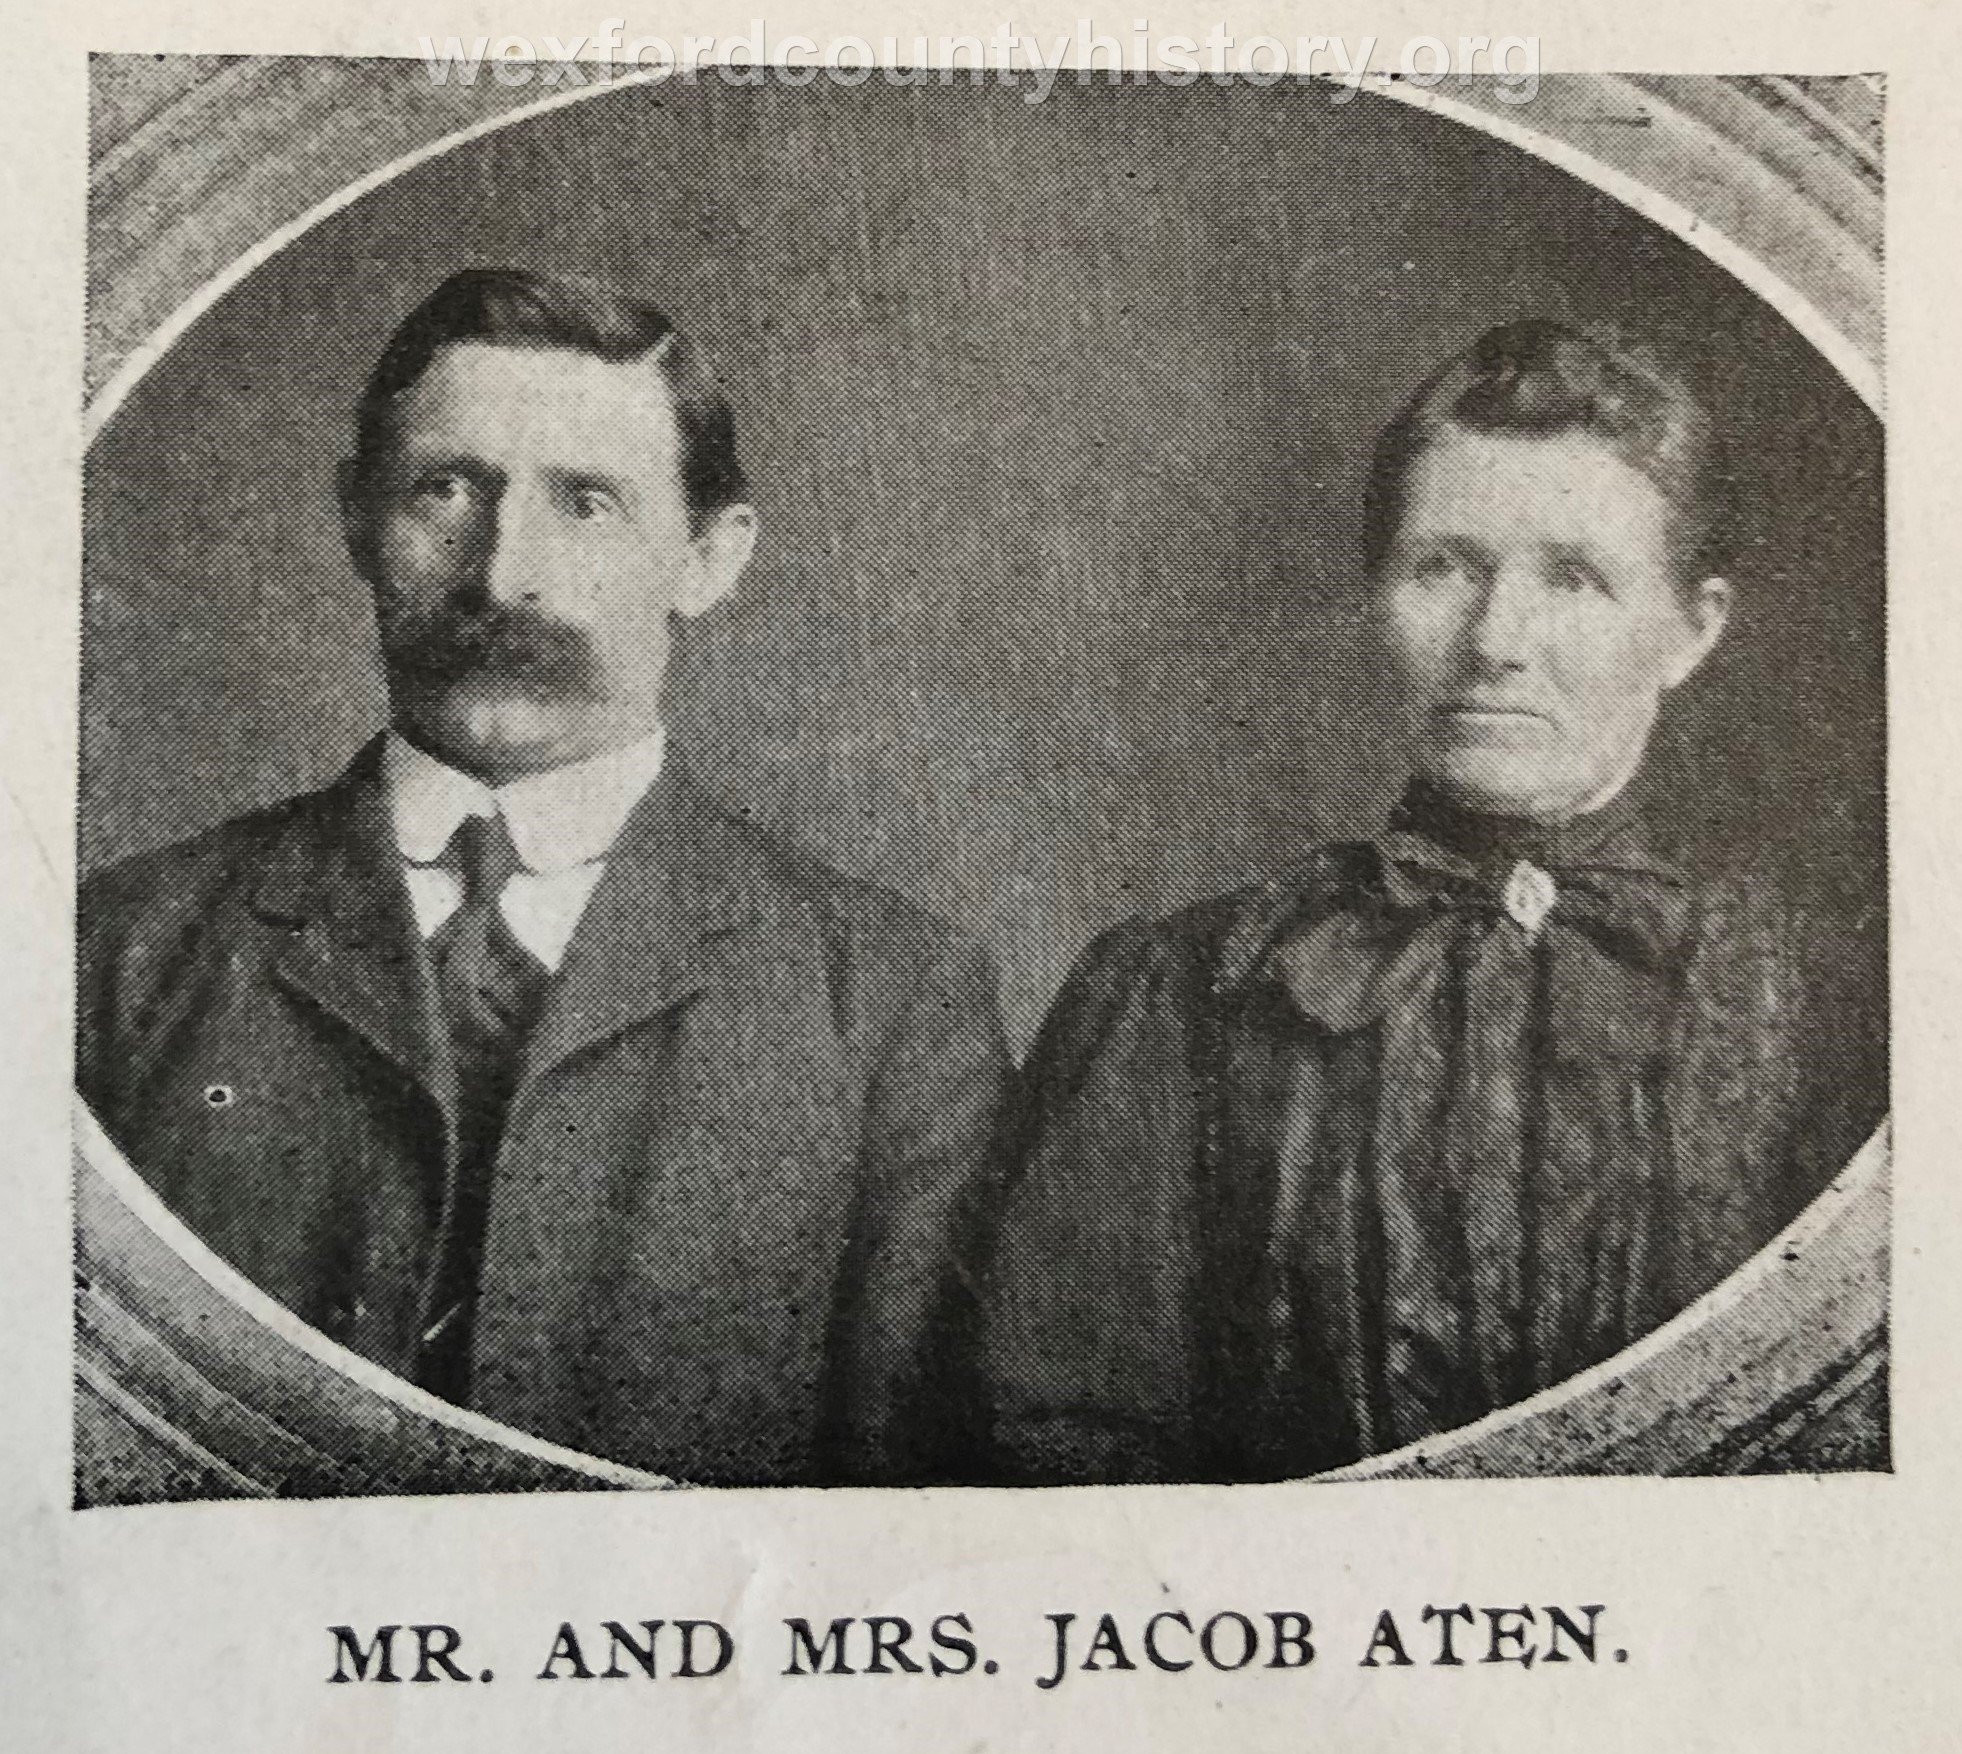 Mr. And Mrs. Jacob Aten